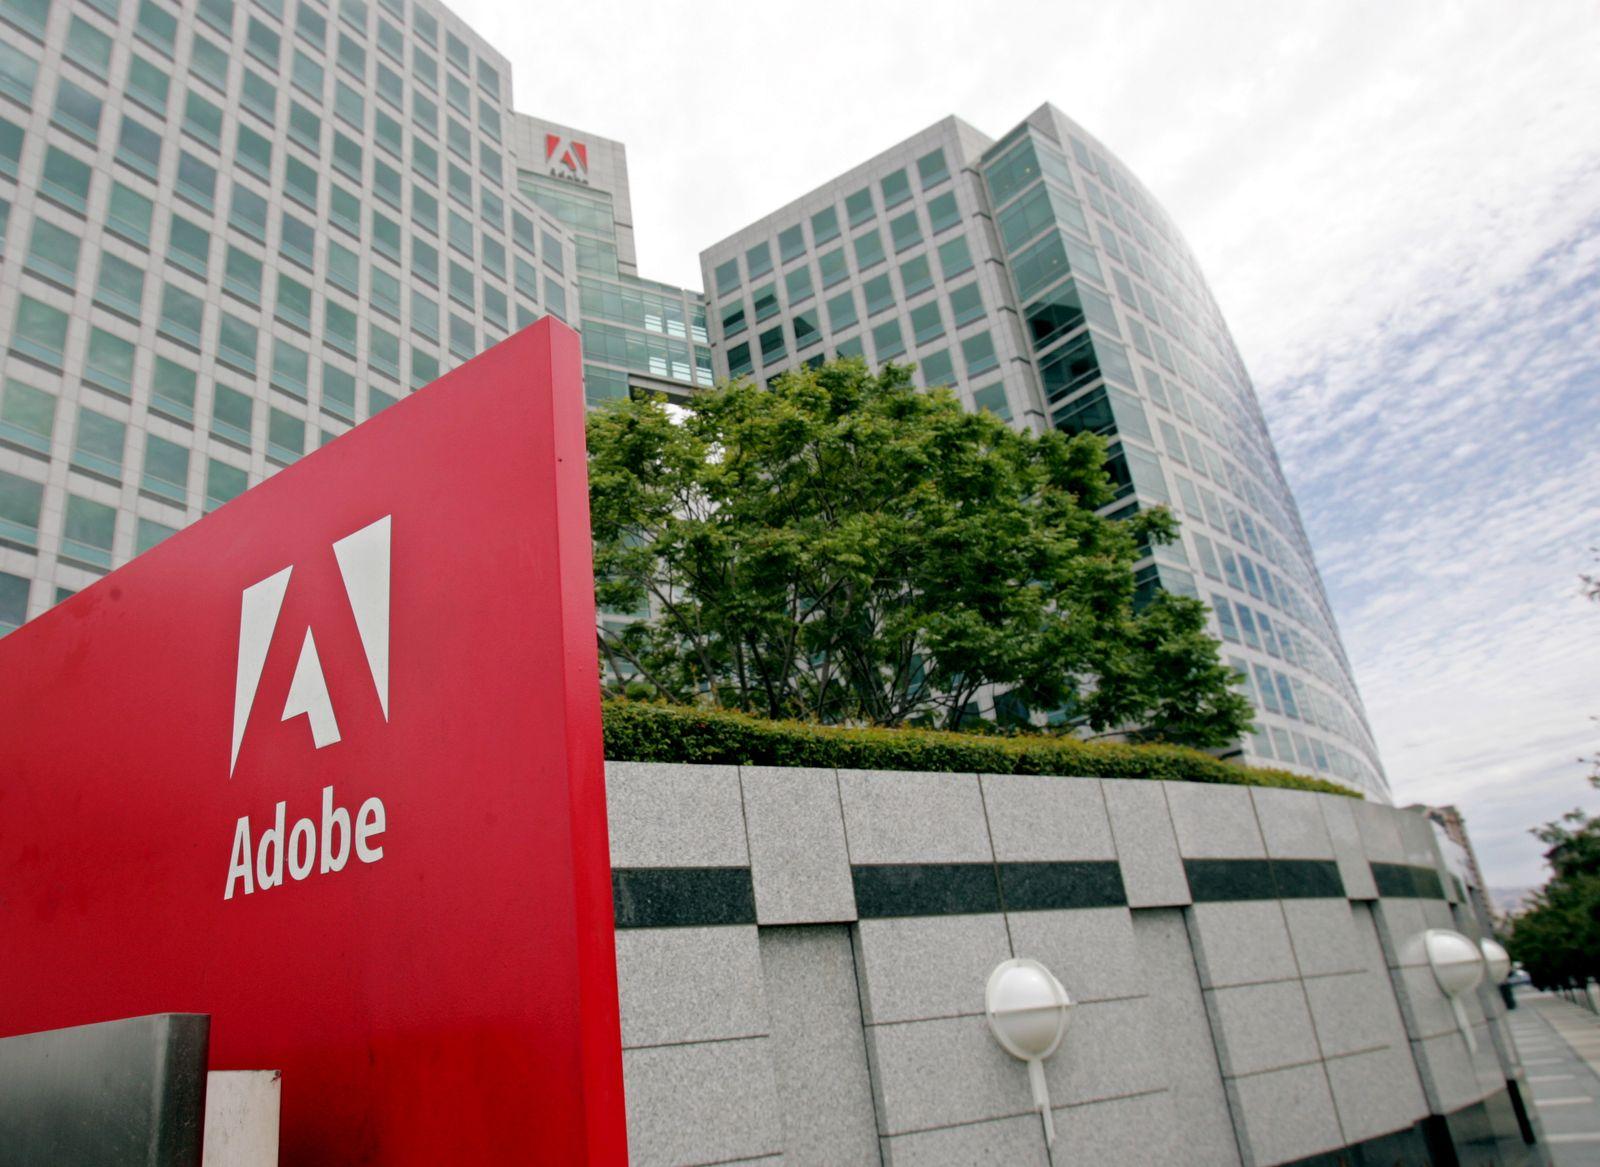 Adobe Firmenzentrale